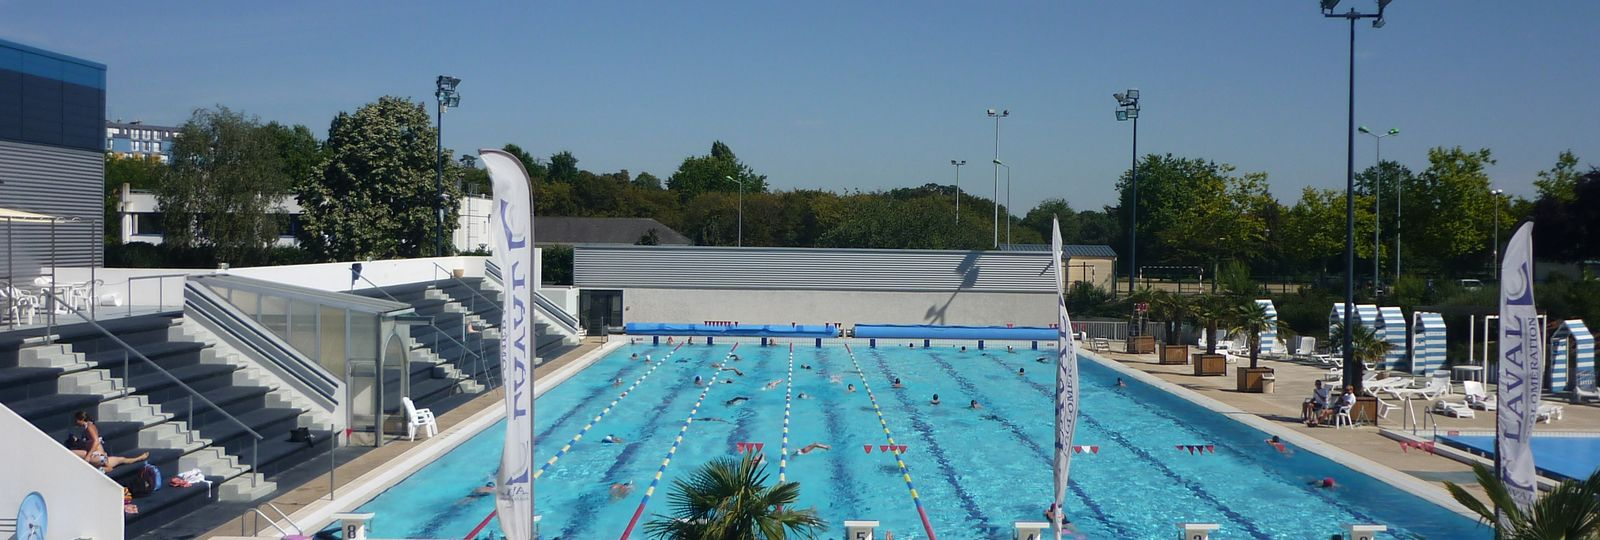 Amazing piscine st nicolas laval 2 piscine de laval dr for Piscine ulaval